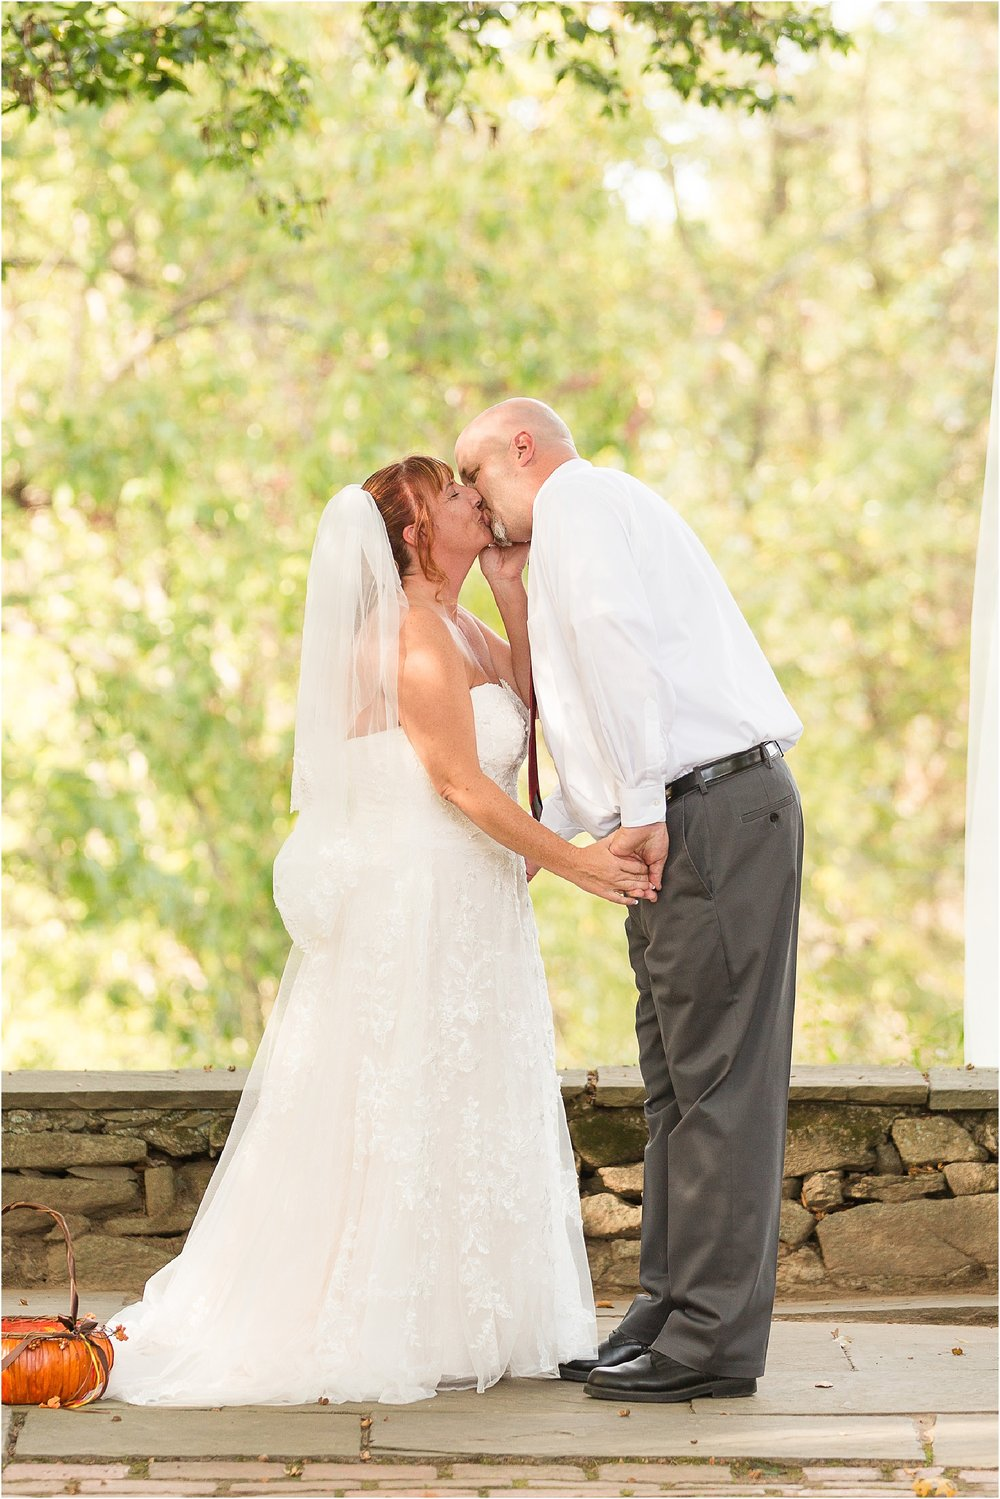 havre-de-grace-wedding-photographer-149.jpg